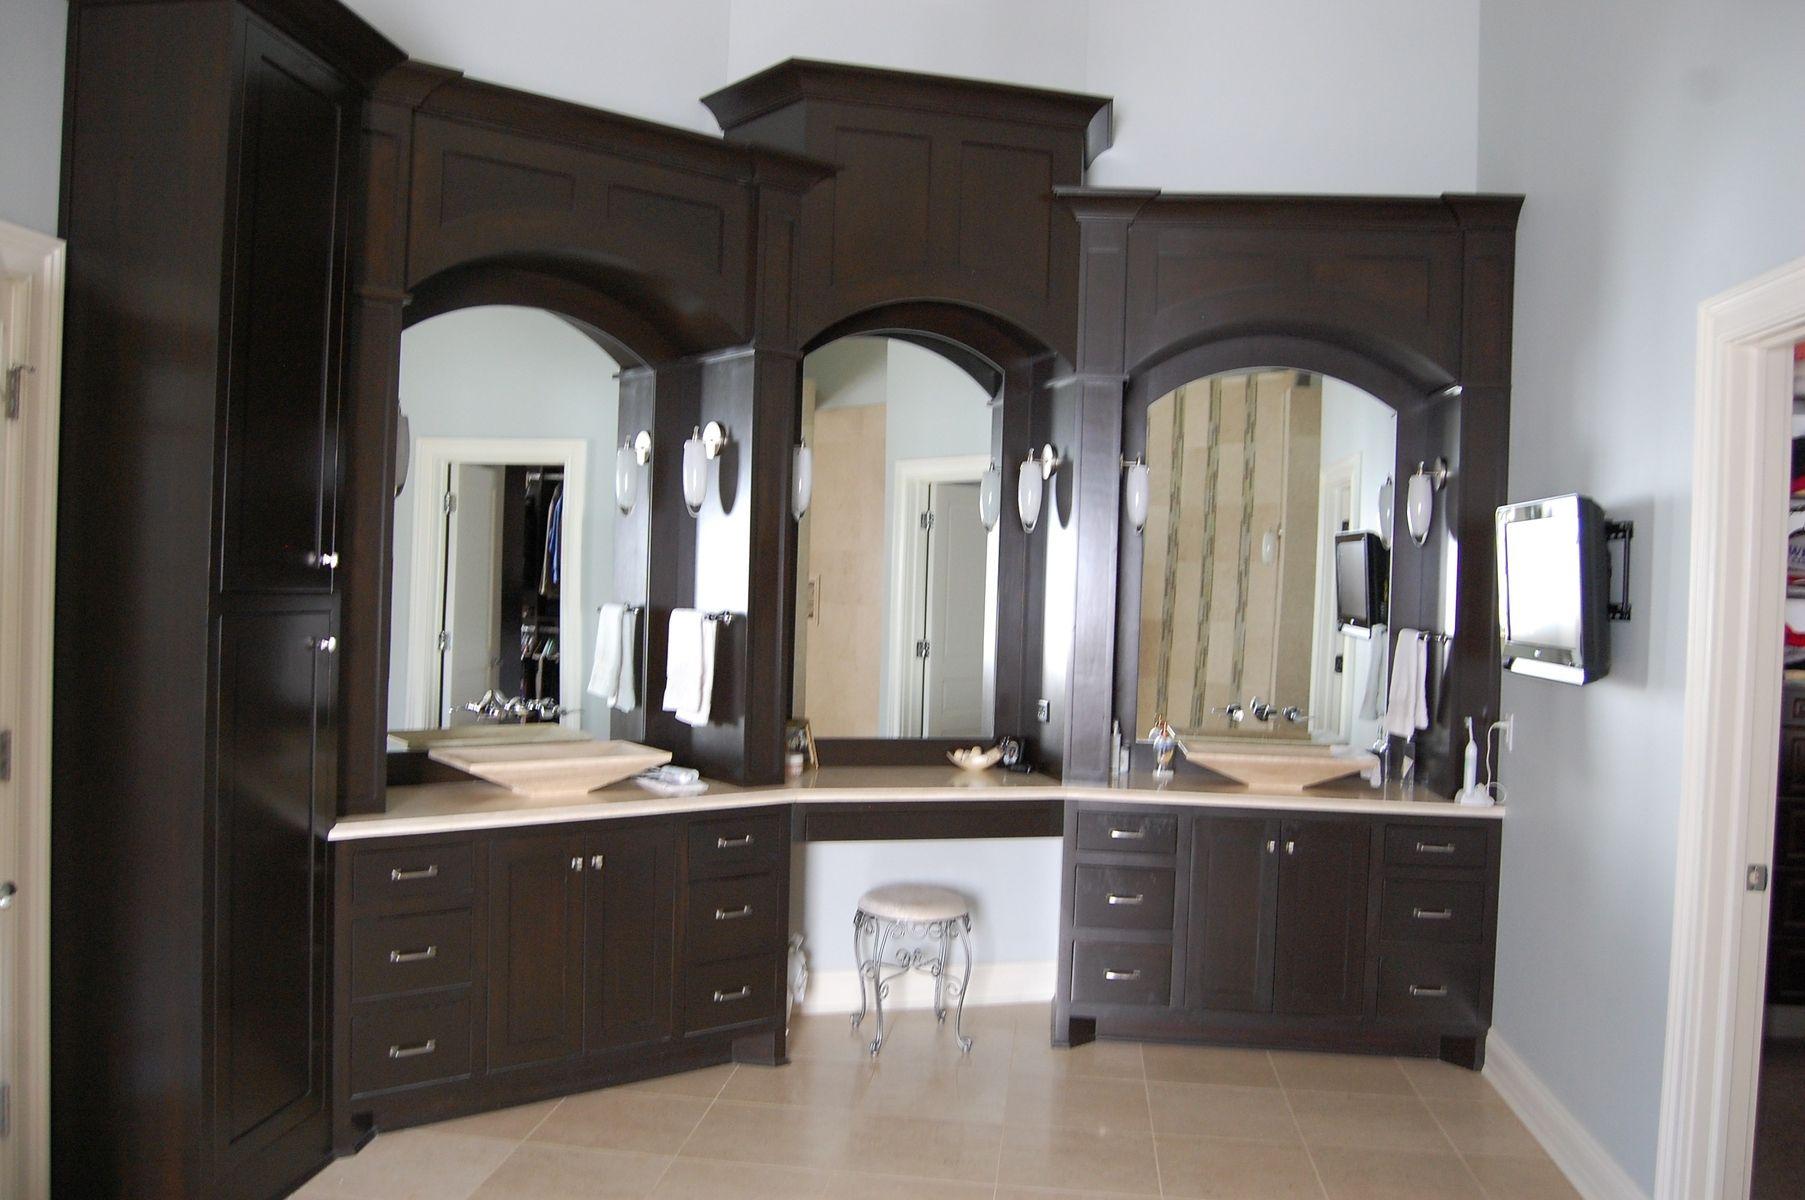 Handmade Custom Master Bath Cabinets By Jr's Custom